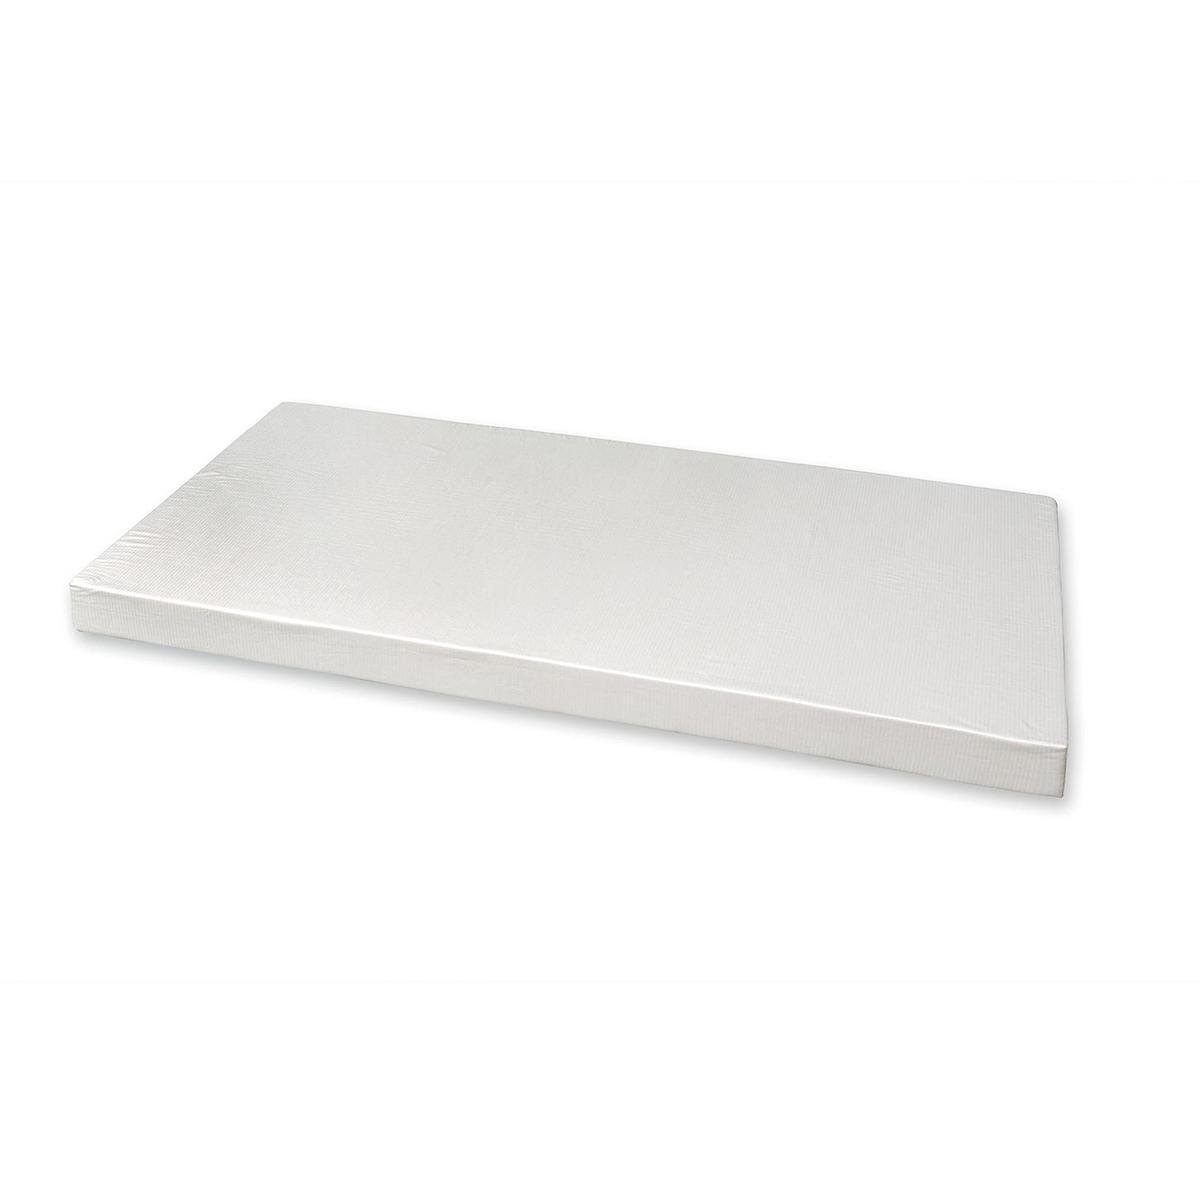 Colchón cajón cama nido 90x176cm SEASIDE Oliver Furniture